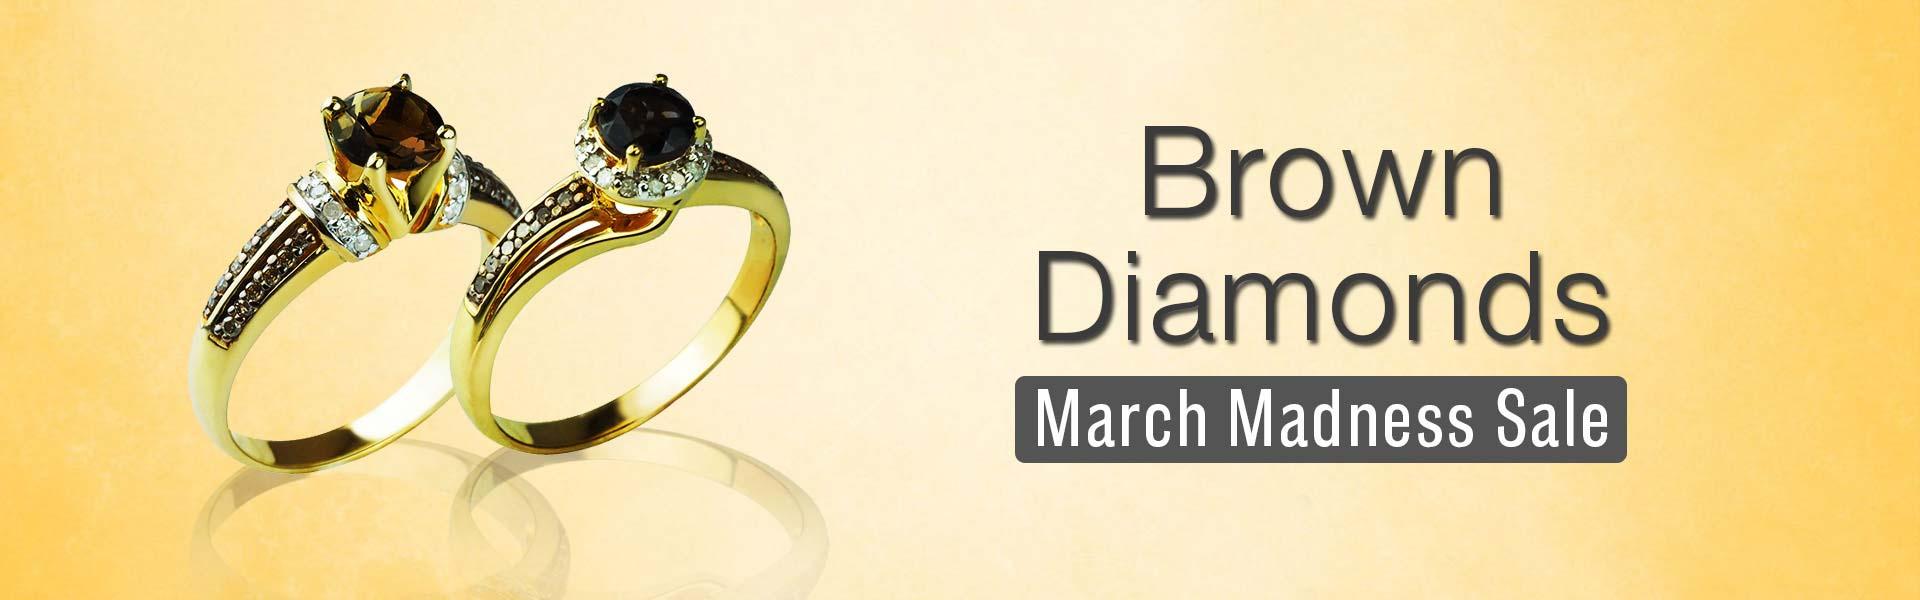 brown diamonds banner